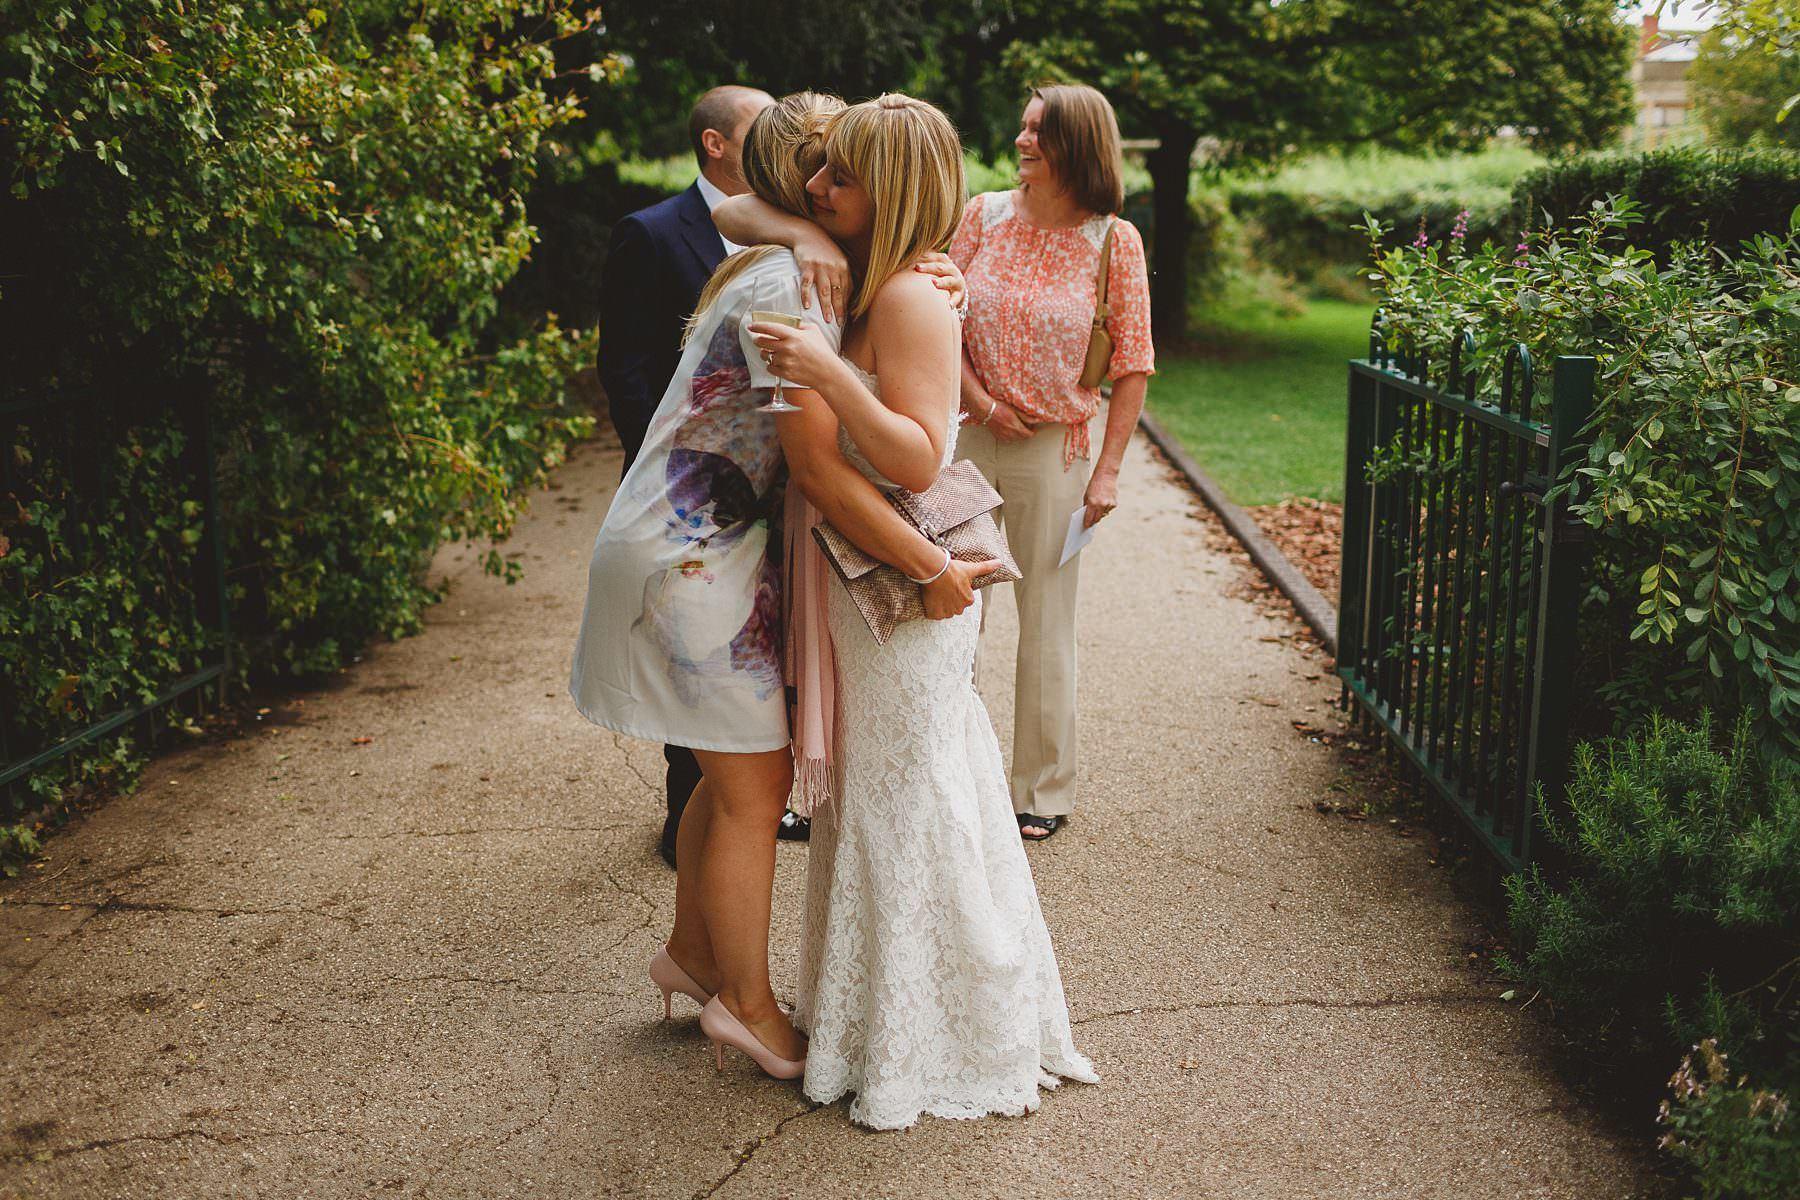 weddings-at-bristol-zoo-047